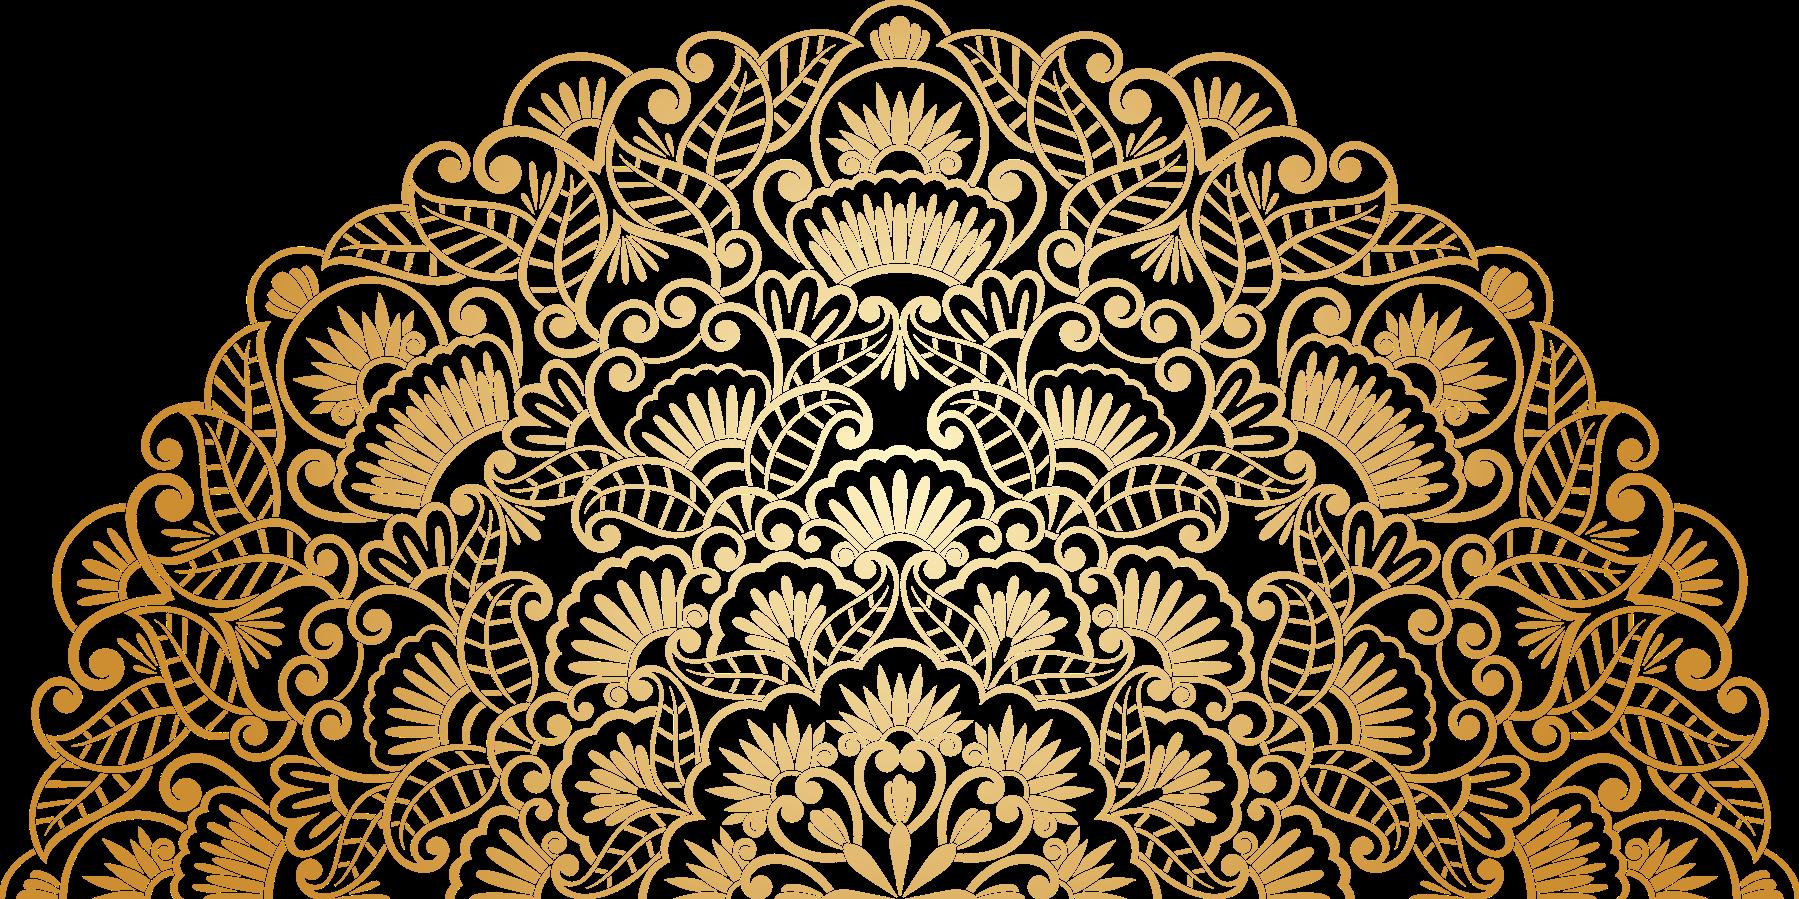 Elegant Coral Rose Gold Artistic Frame Png Element Gold Rose Gold Frame Png Transparent Clipart Image And Psd File For Free Download Rose Gold Clips Flower Border Clipart Rose Gold Flower